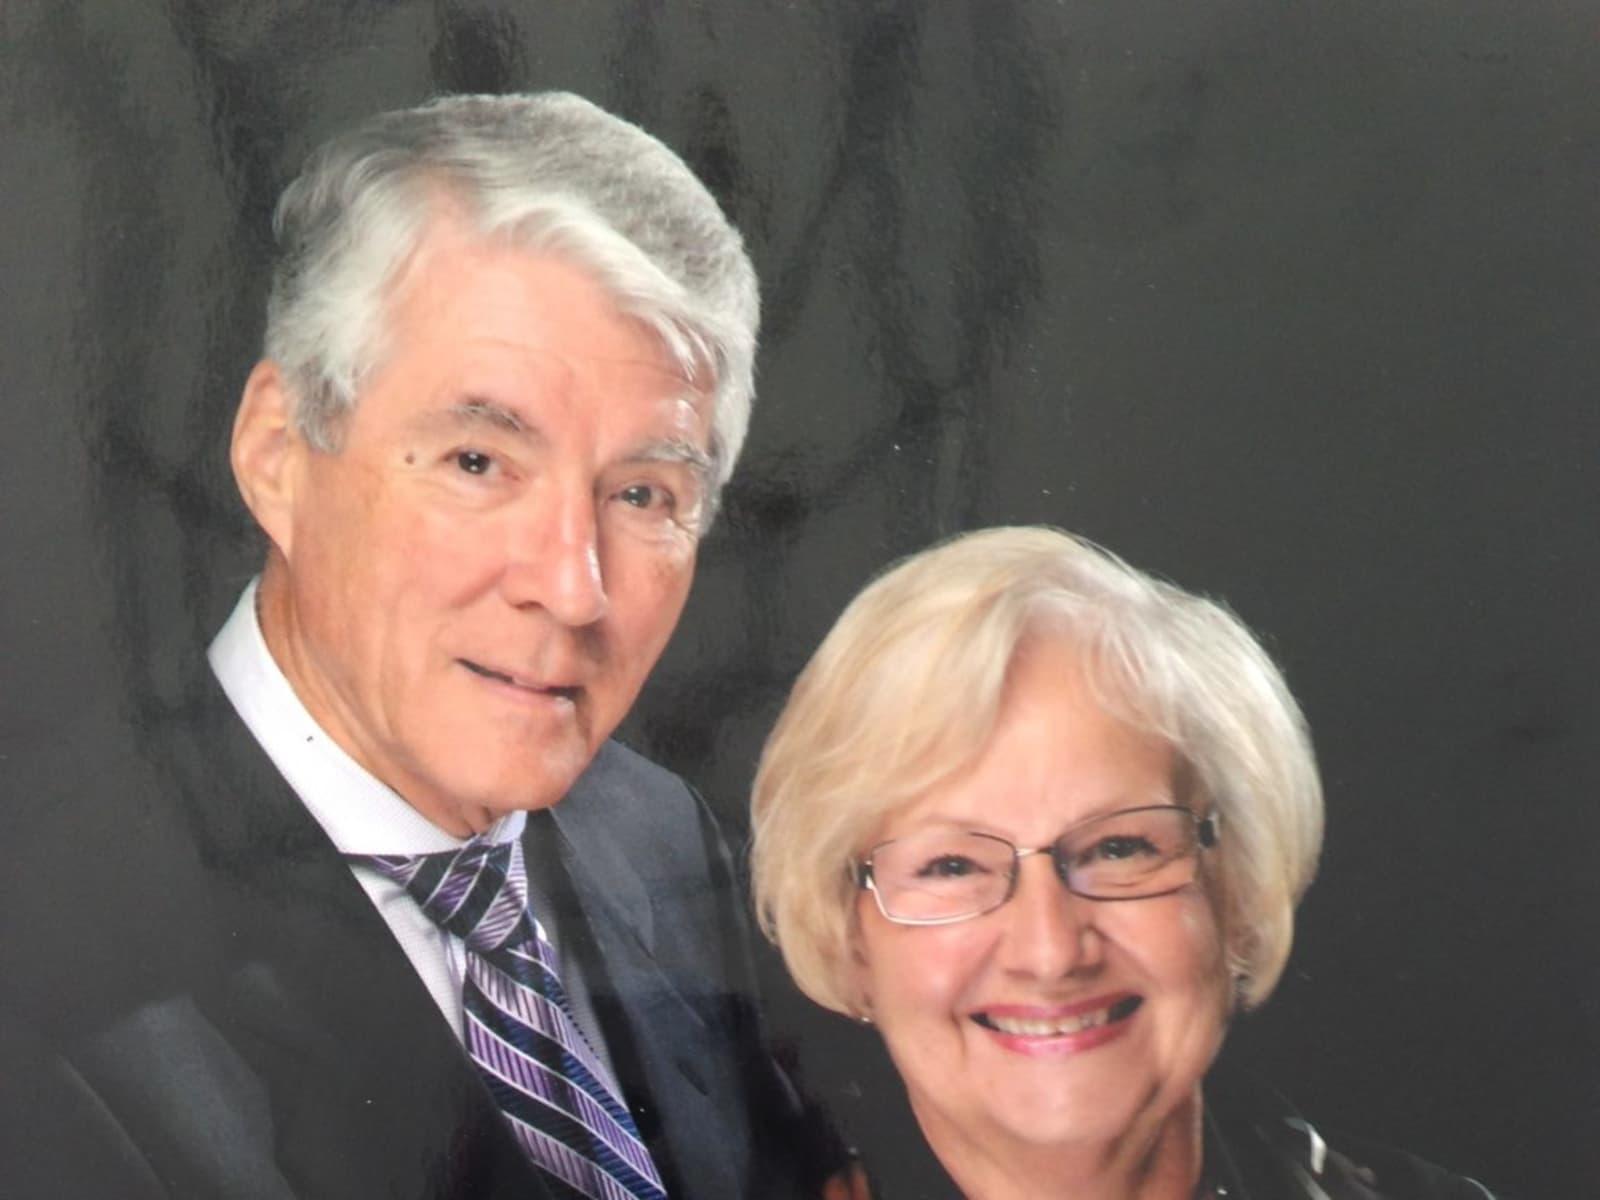 Dave & Elaine from Calgary, Alberta, Canada